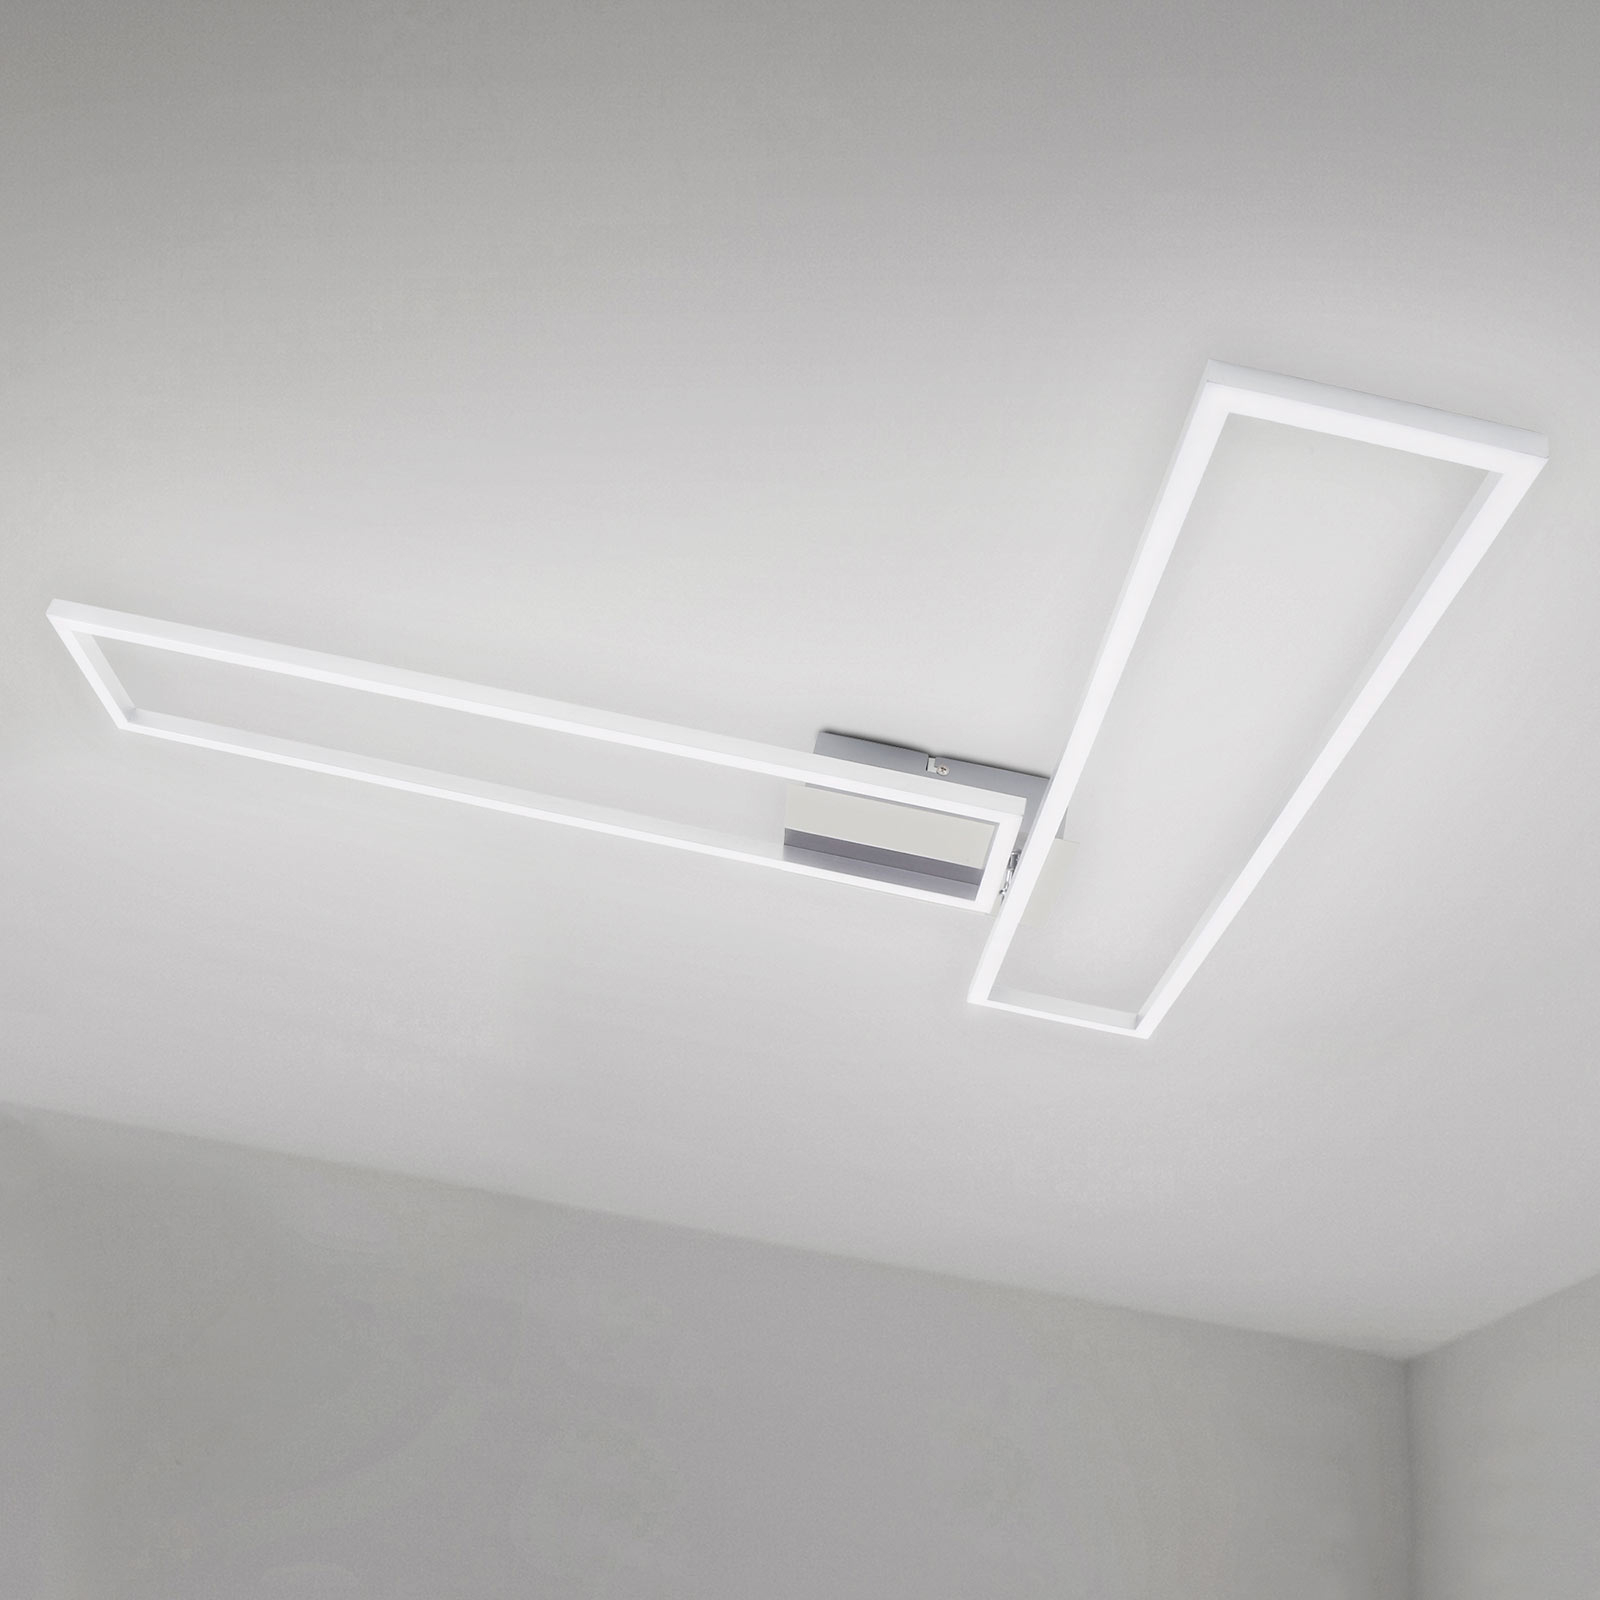 Taklampa Frame WiFi CCT, fjärrkontroll, aluminum